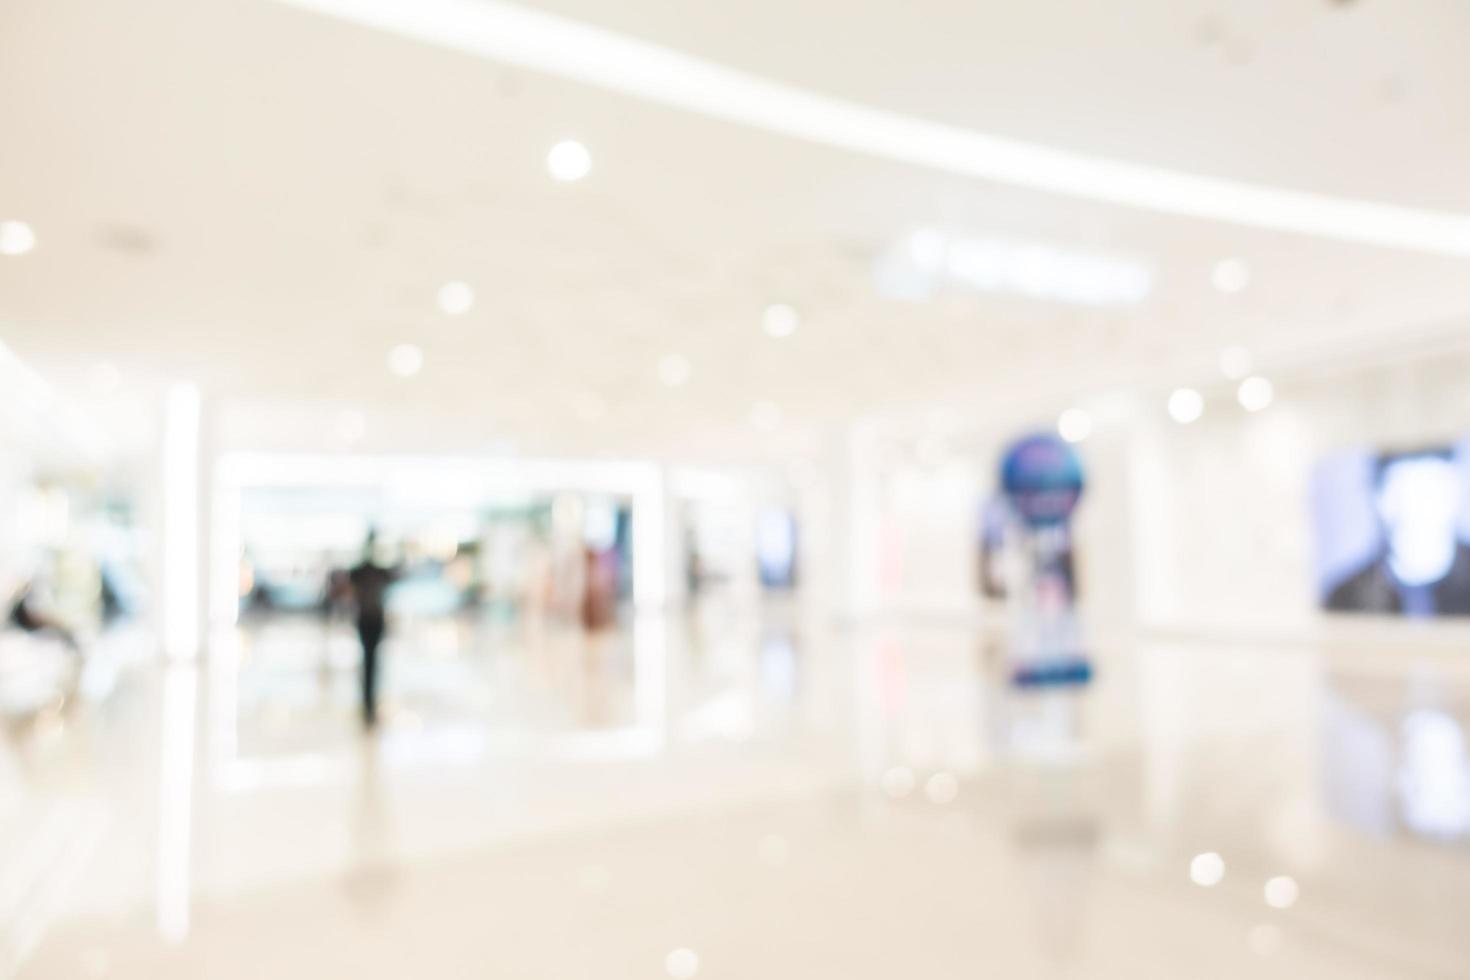 abstract intreepupil winkelcentrum interieur foto